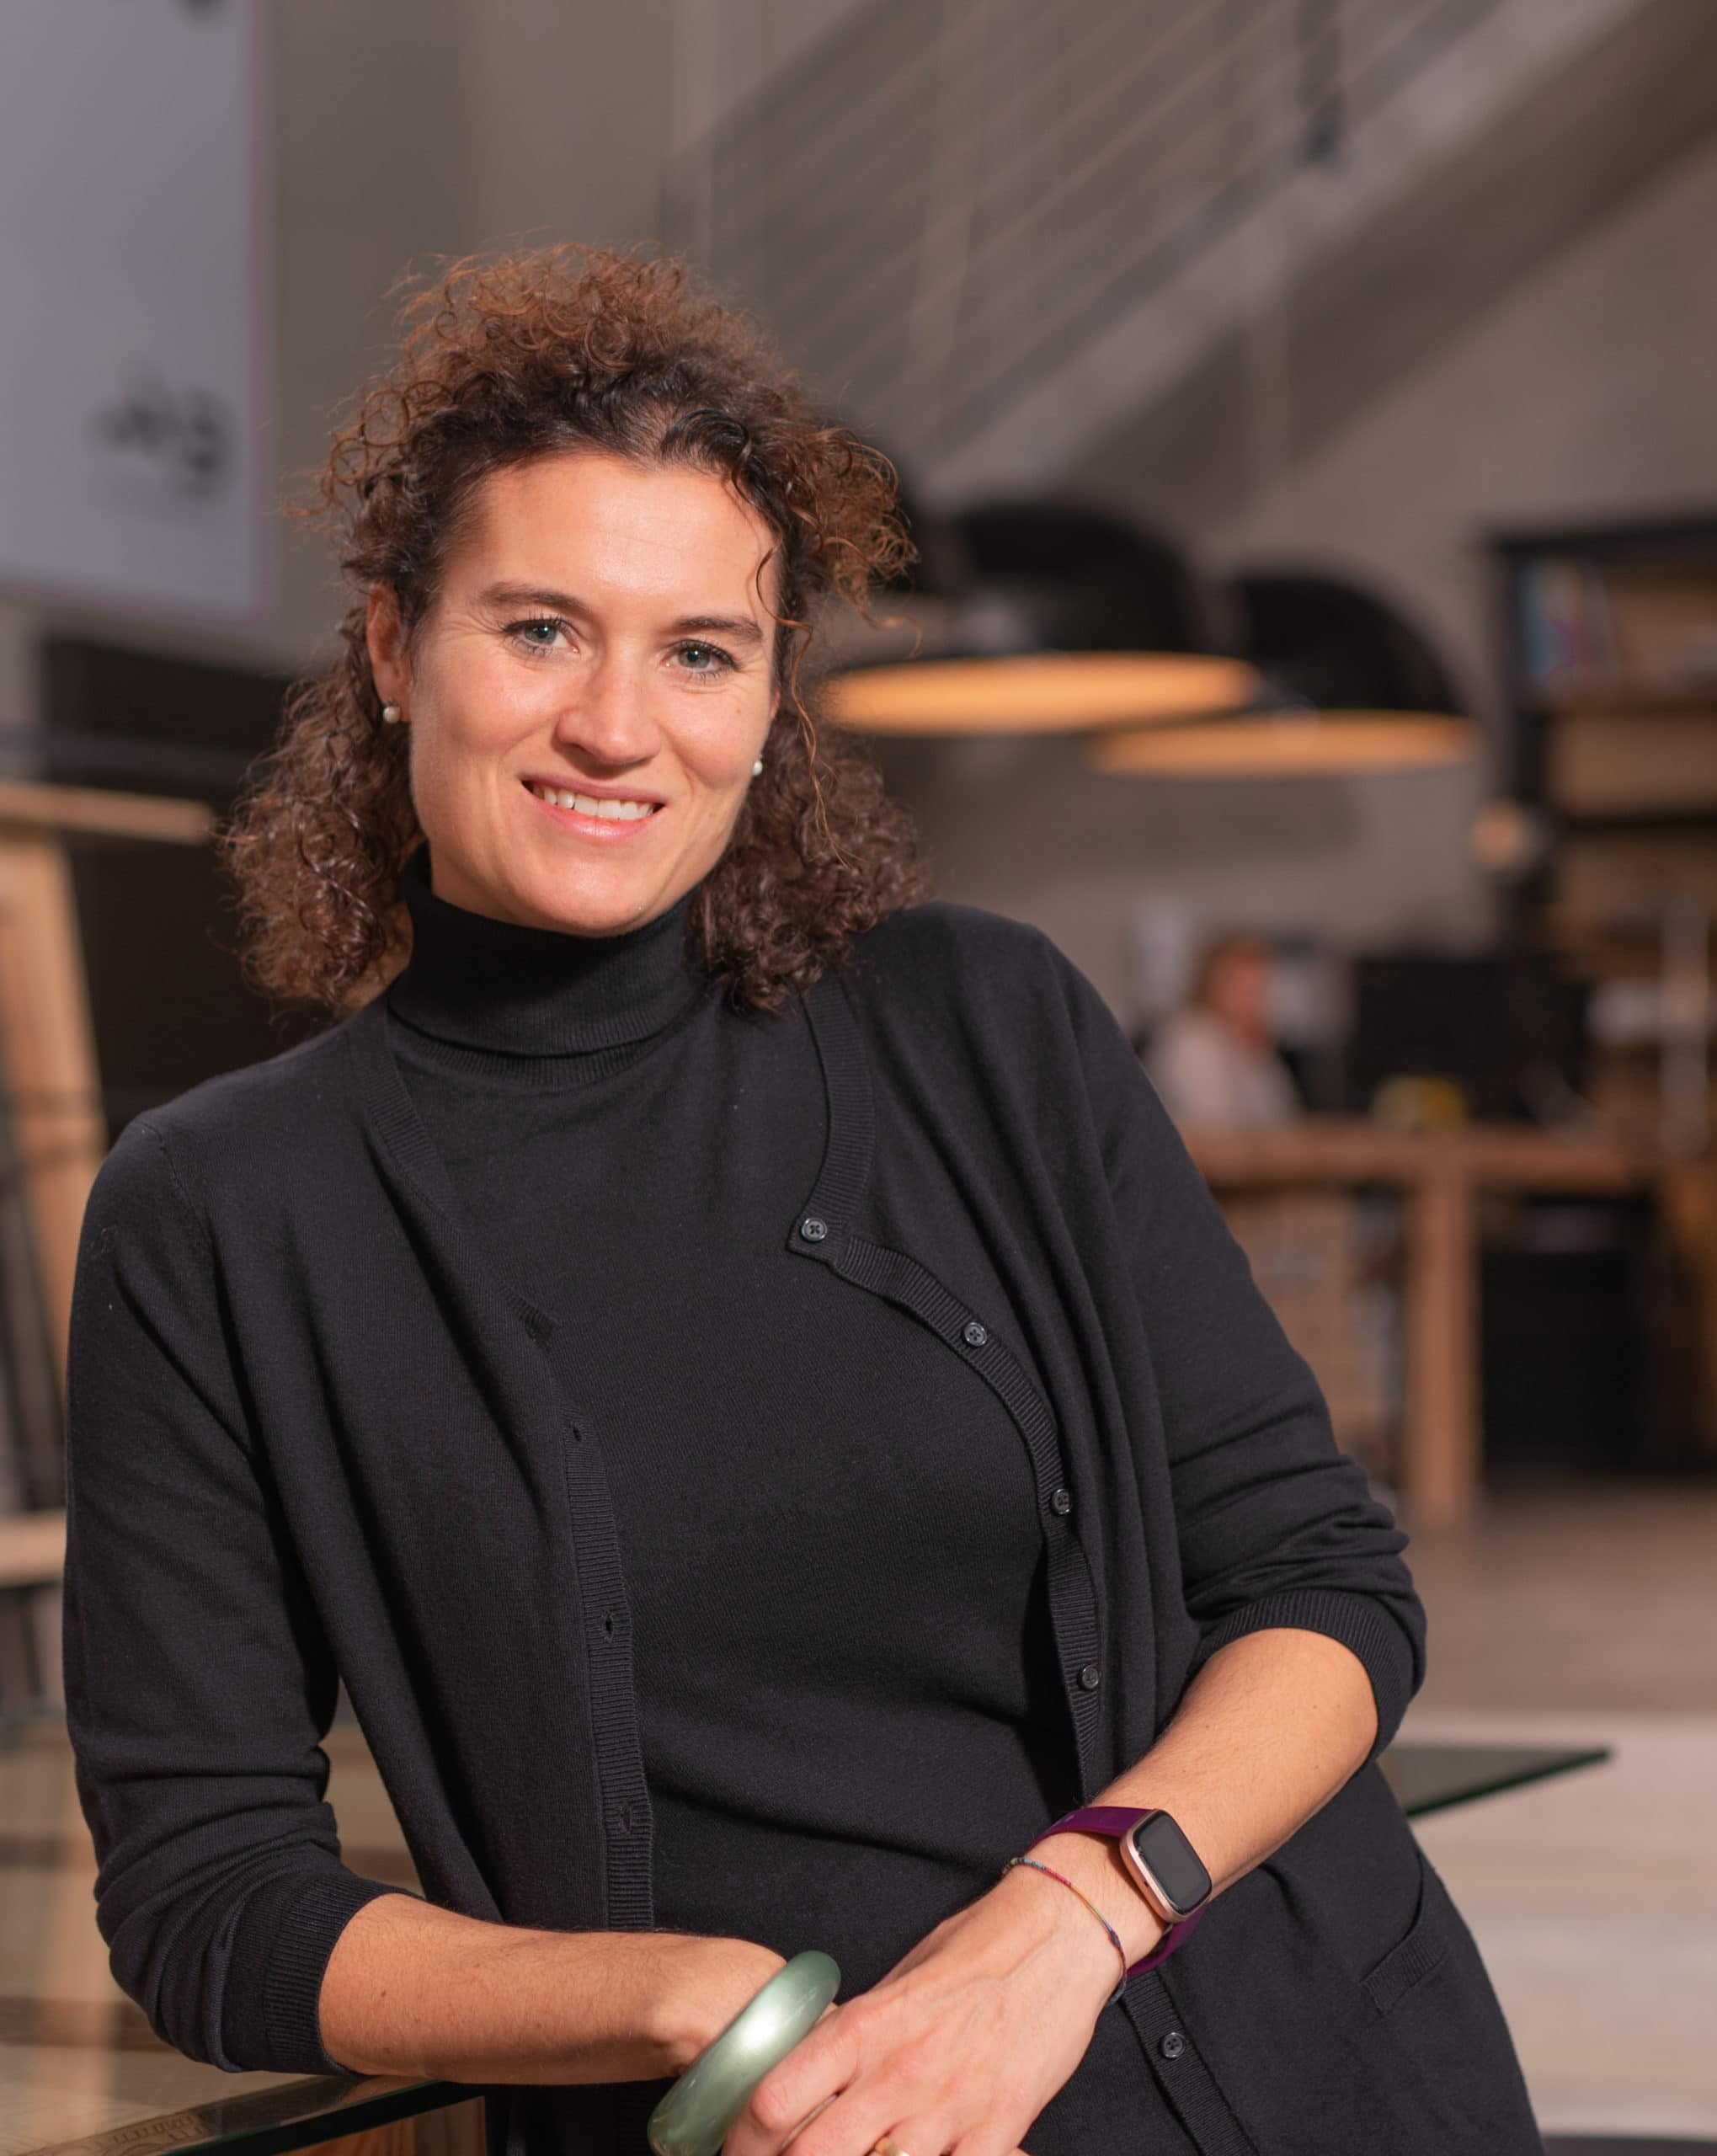 Saskia Haldner